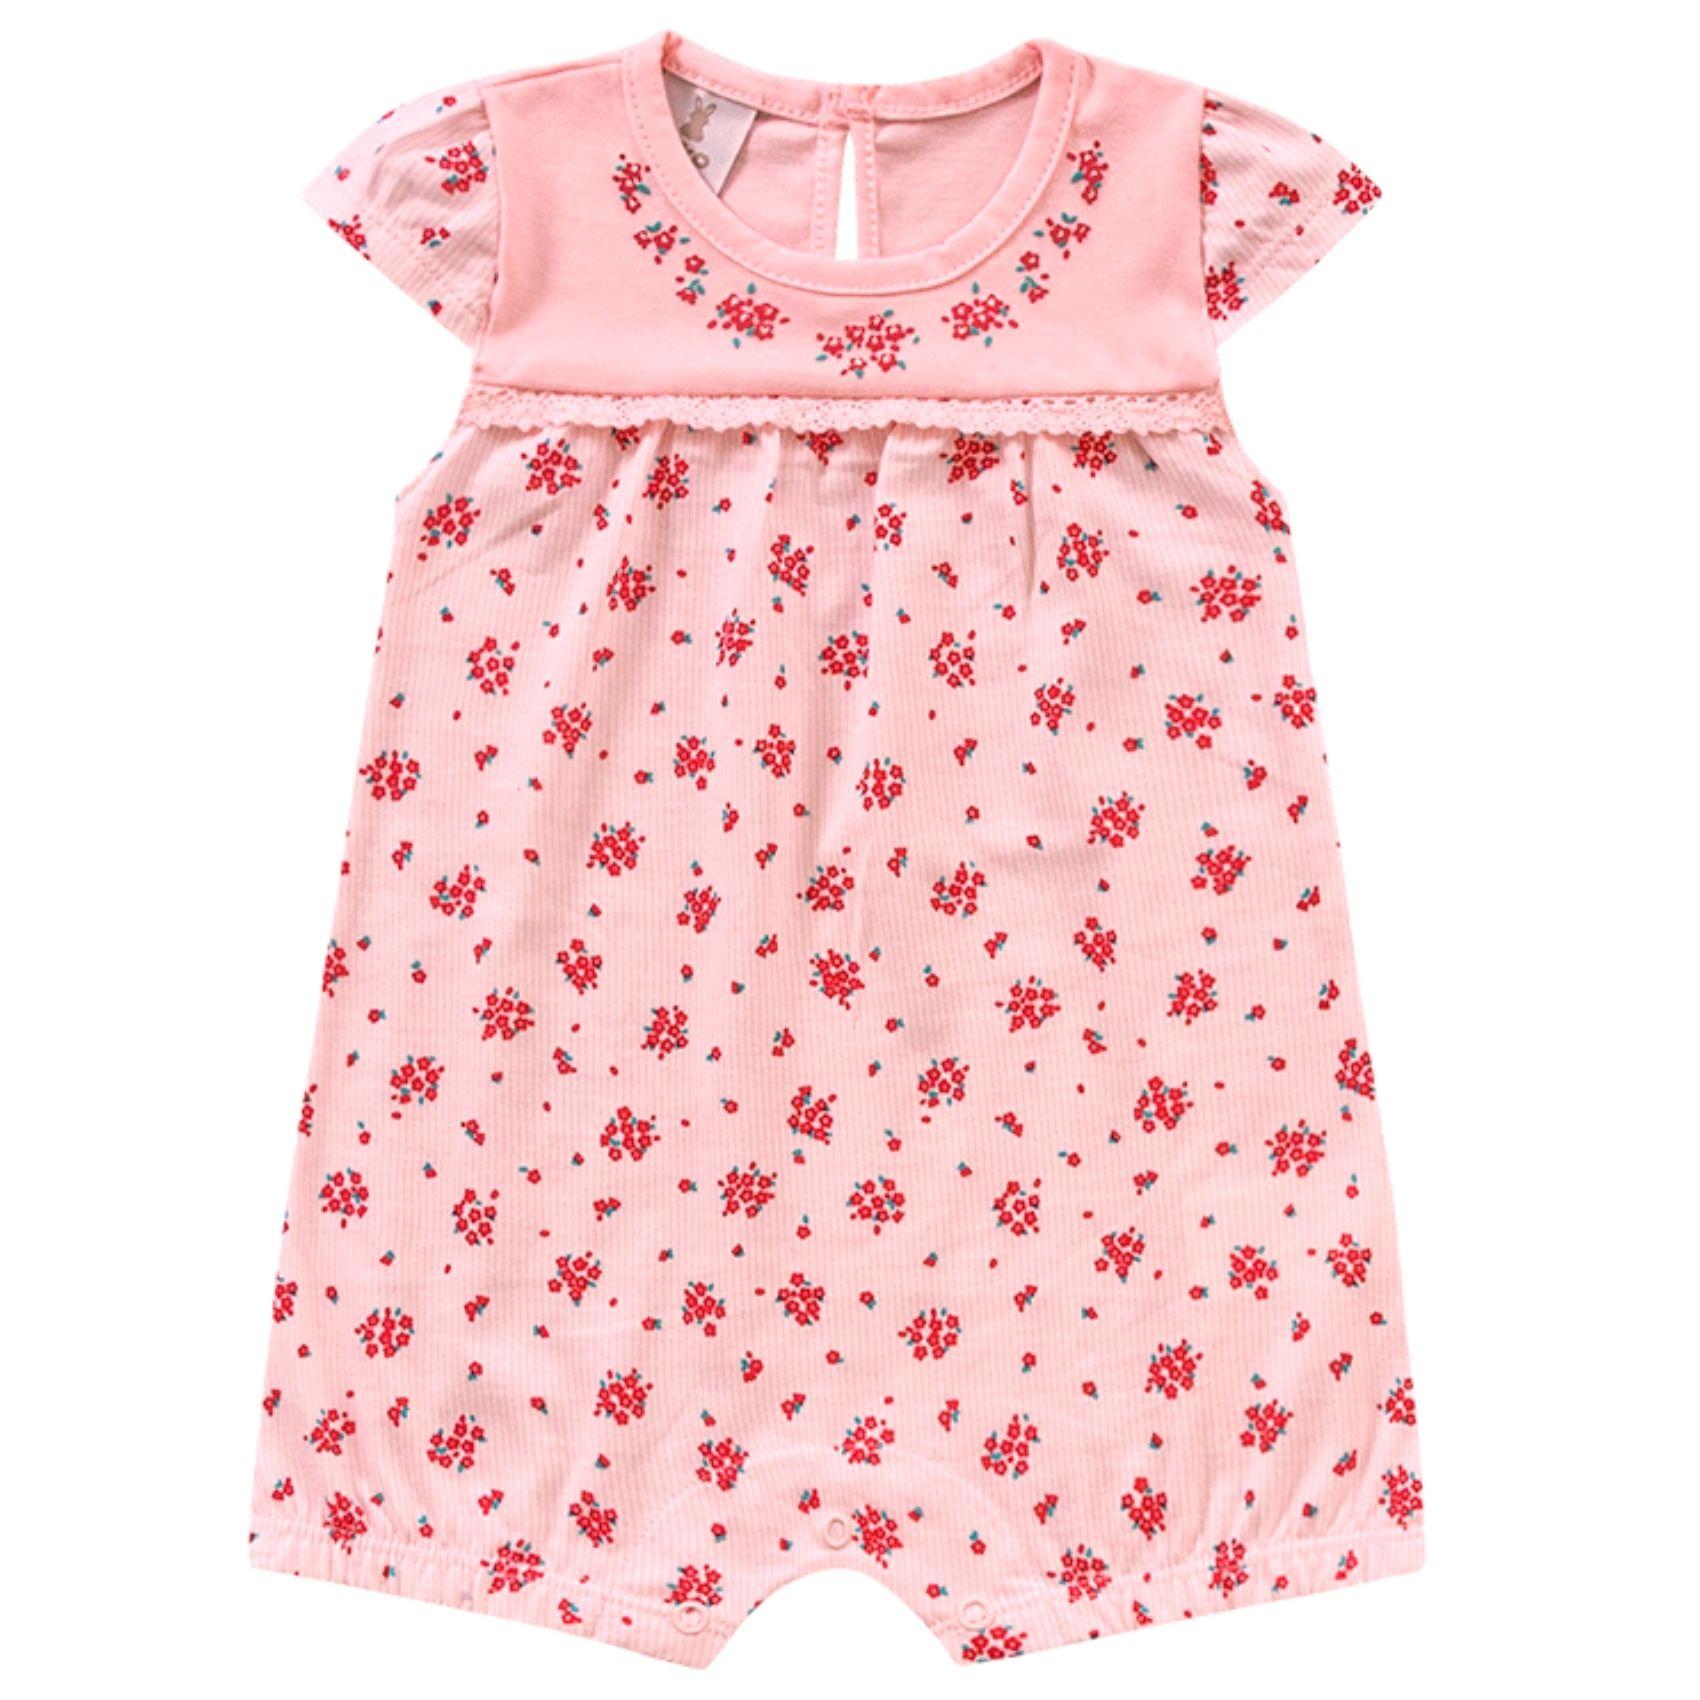 Macacão Floral Rosa Kiko Baby Romper